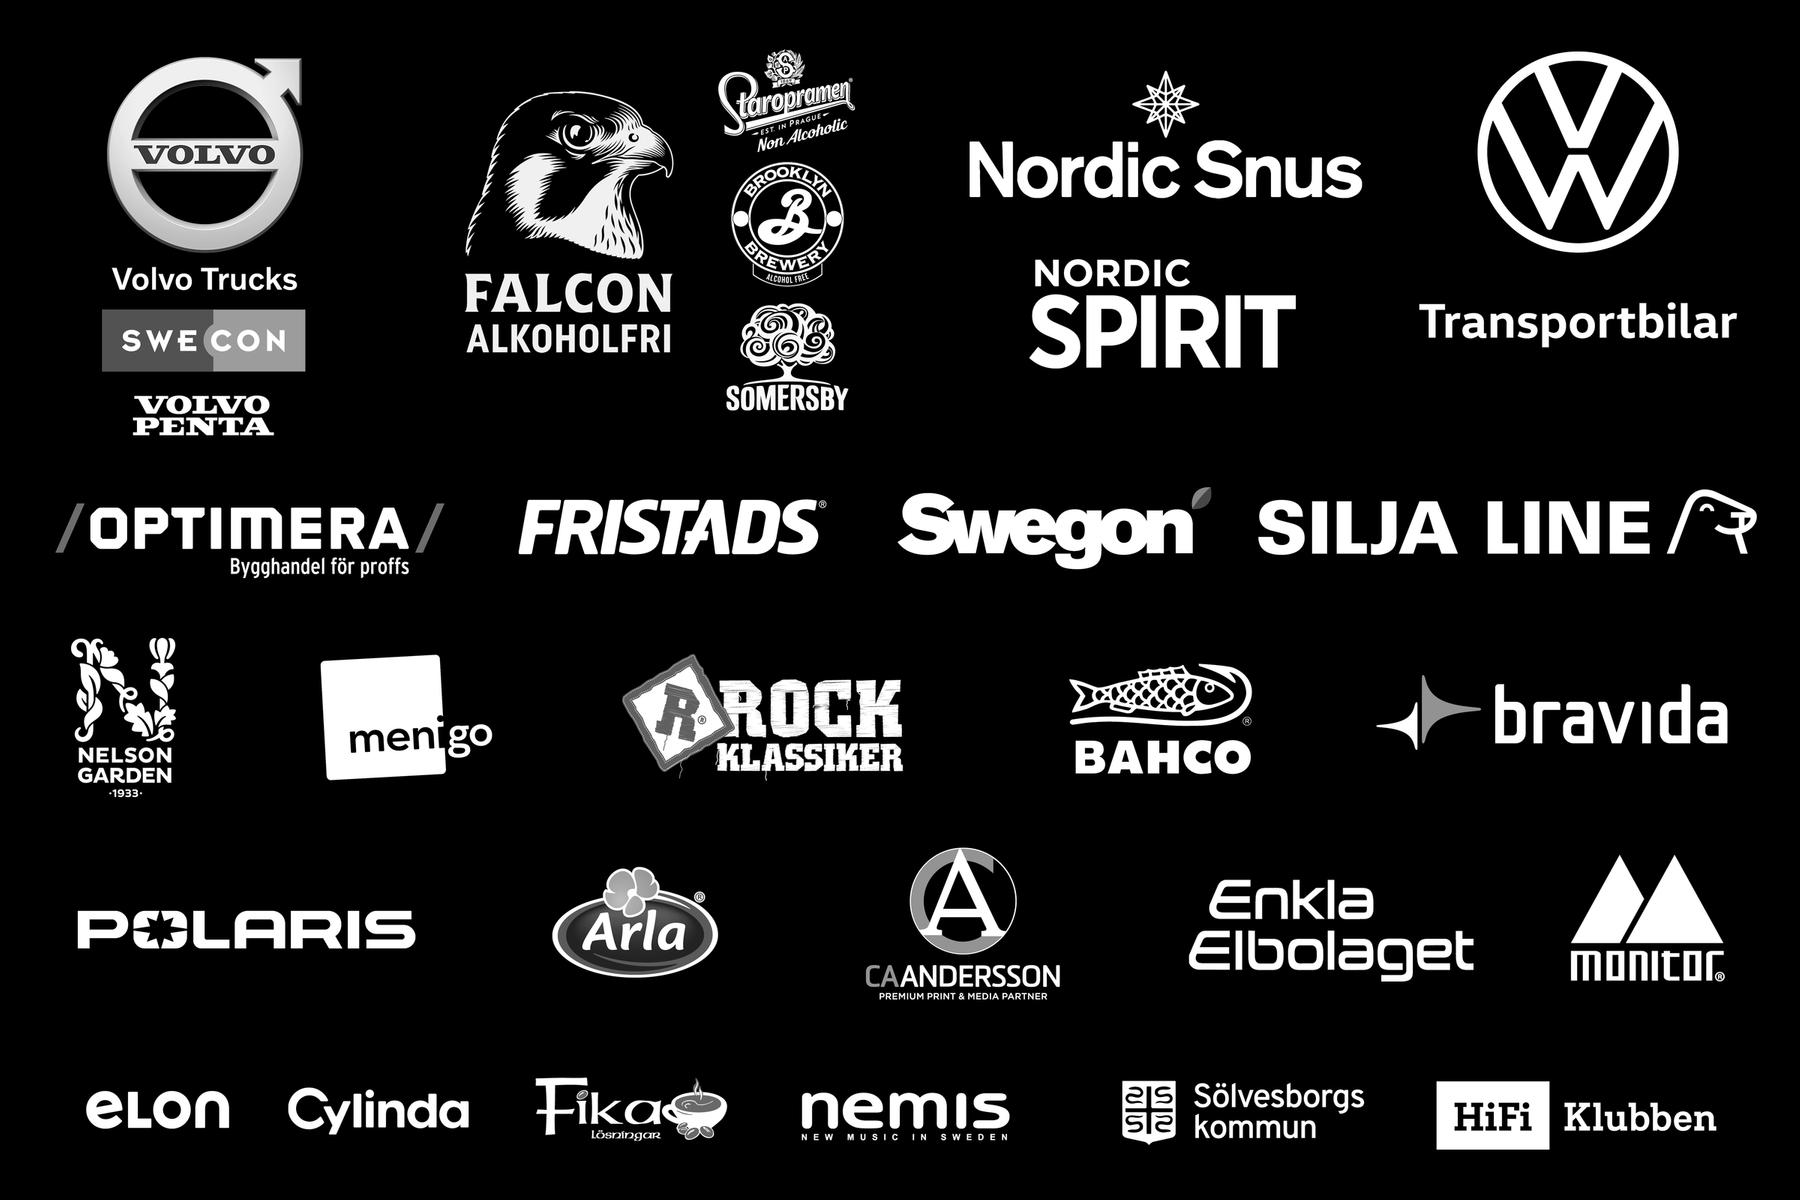 banner-partners-webben-startsida-2020-v4-bw.png